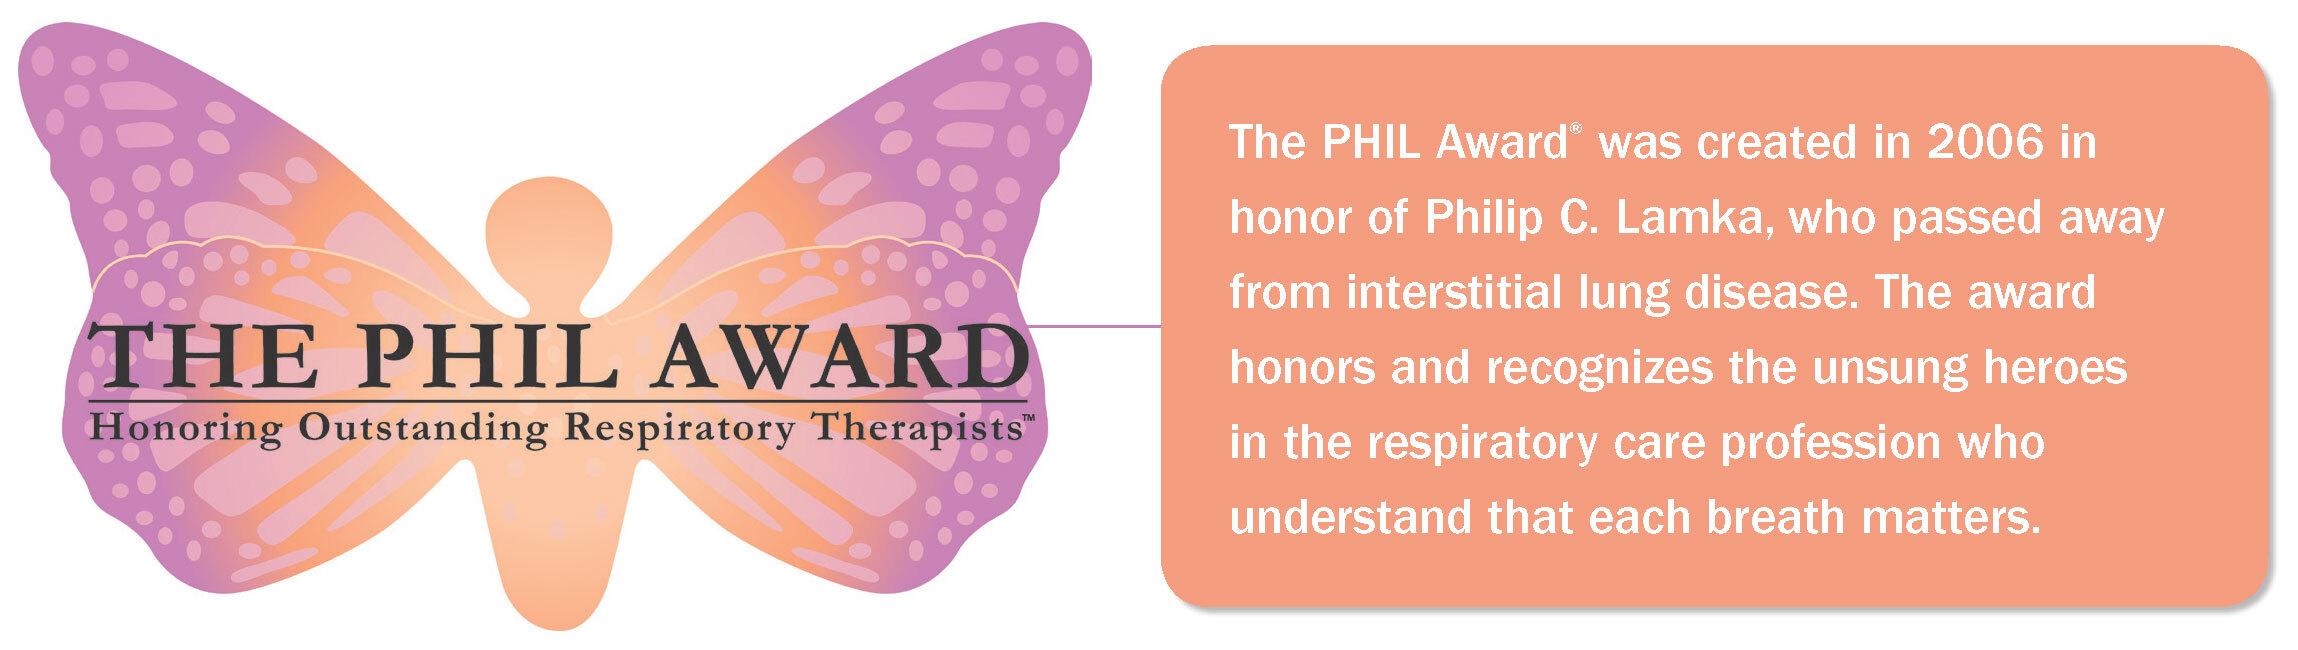 The PHIL Award